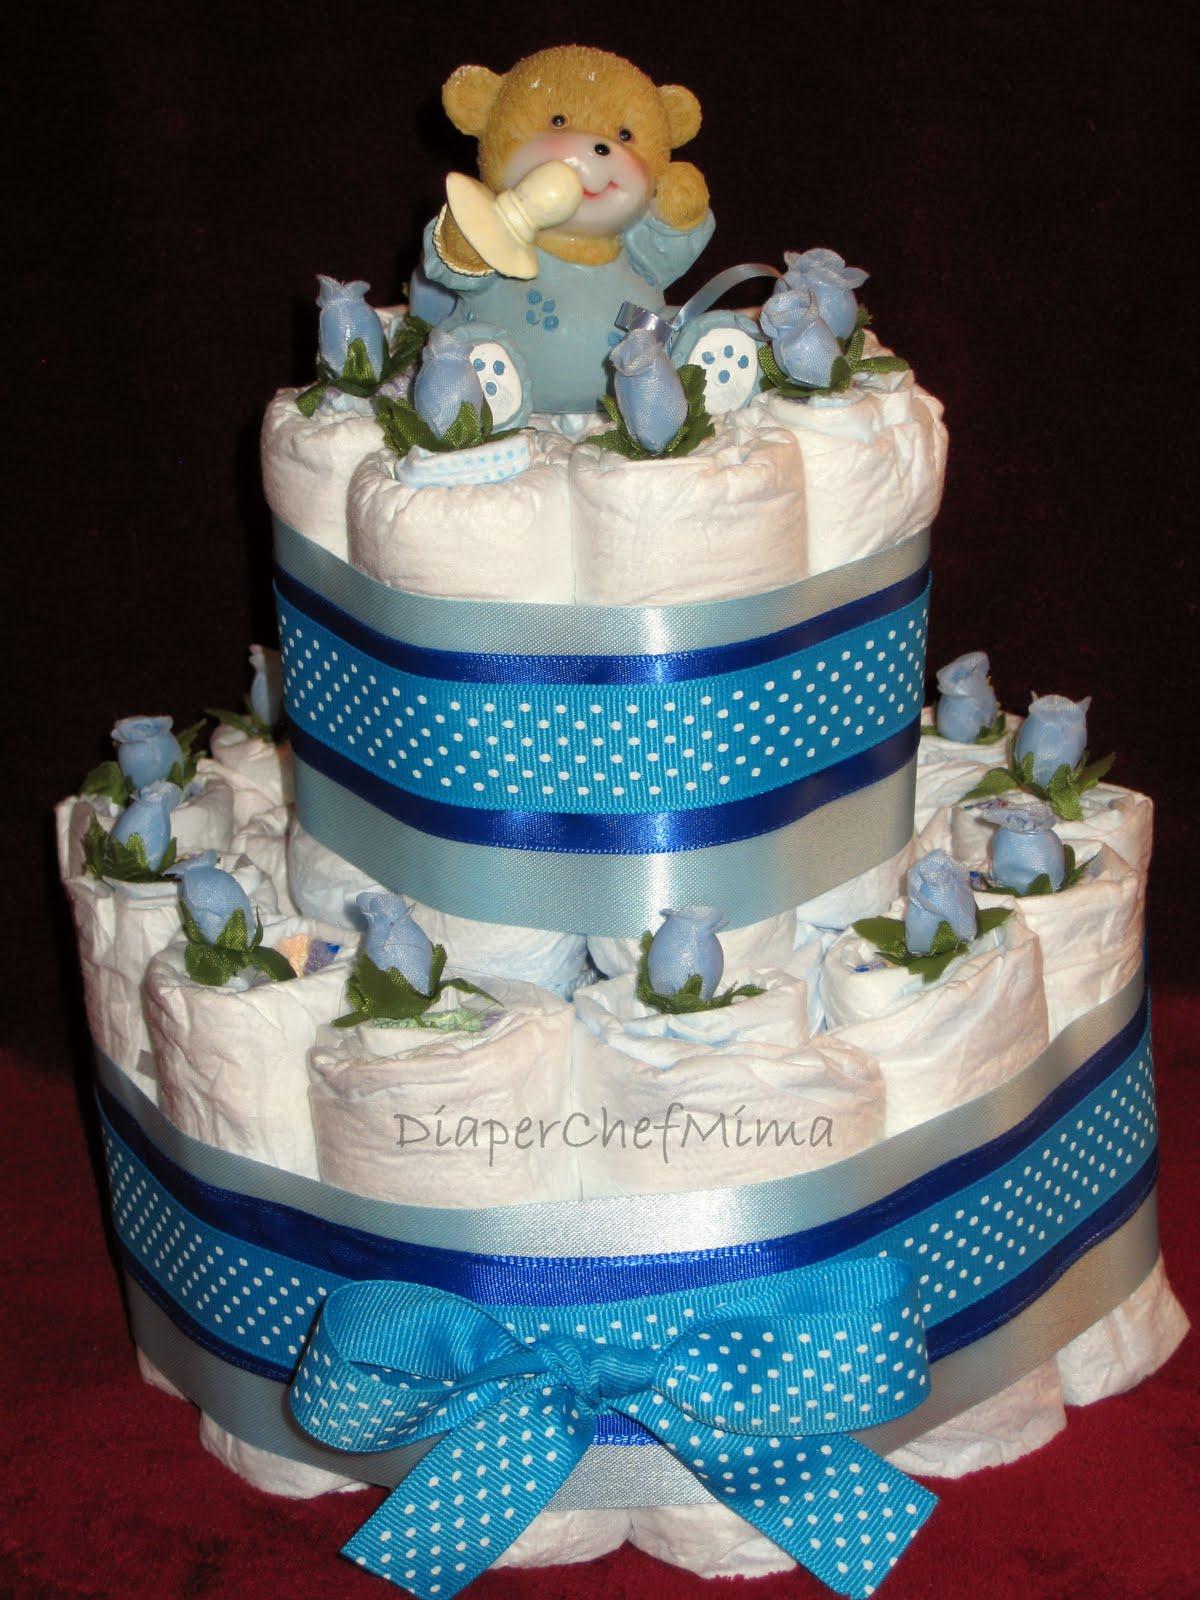 Diaper Chef Mima: Baby Shower Diaper Cake Centerpieces